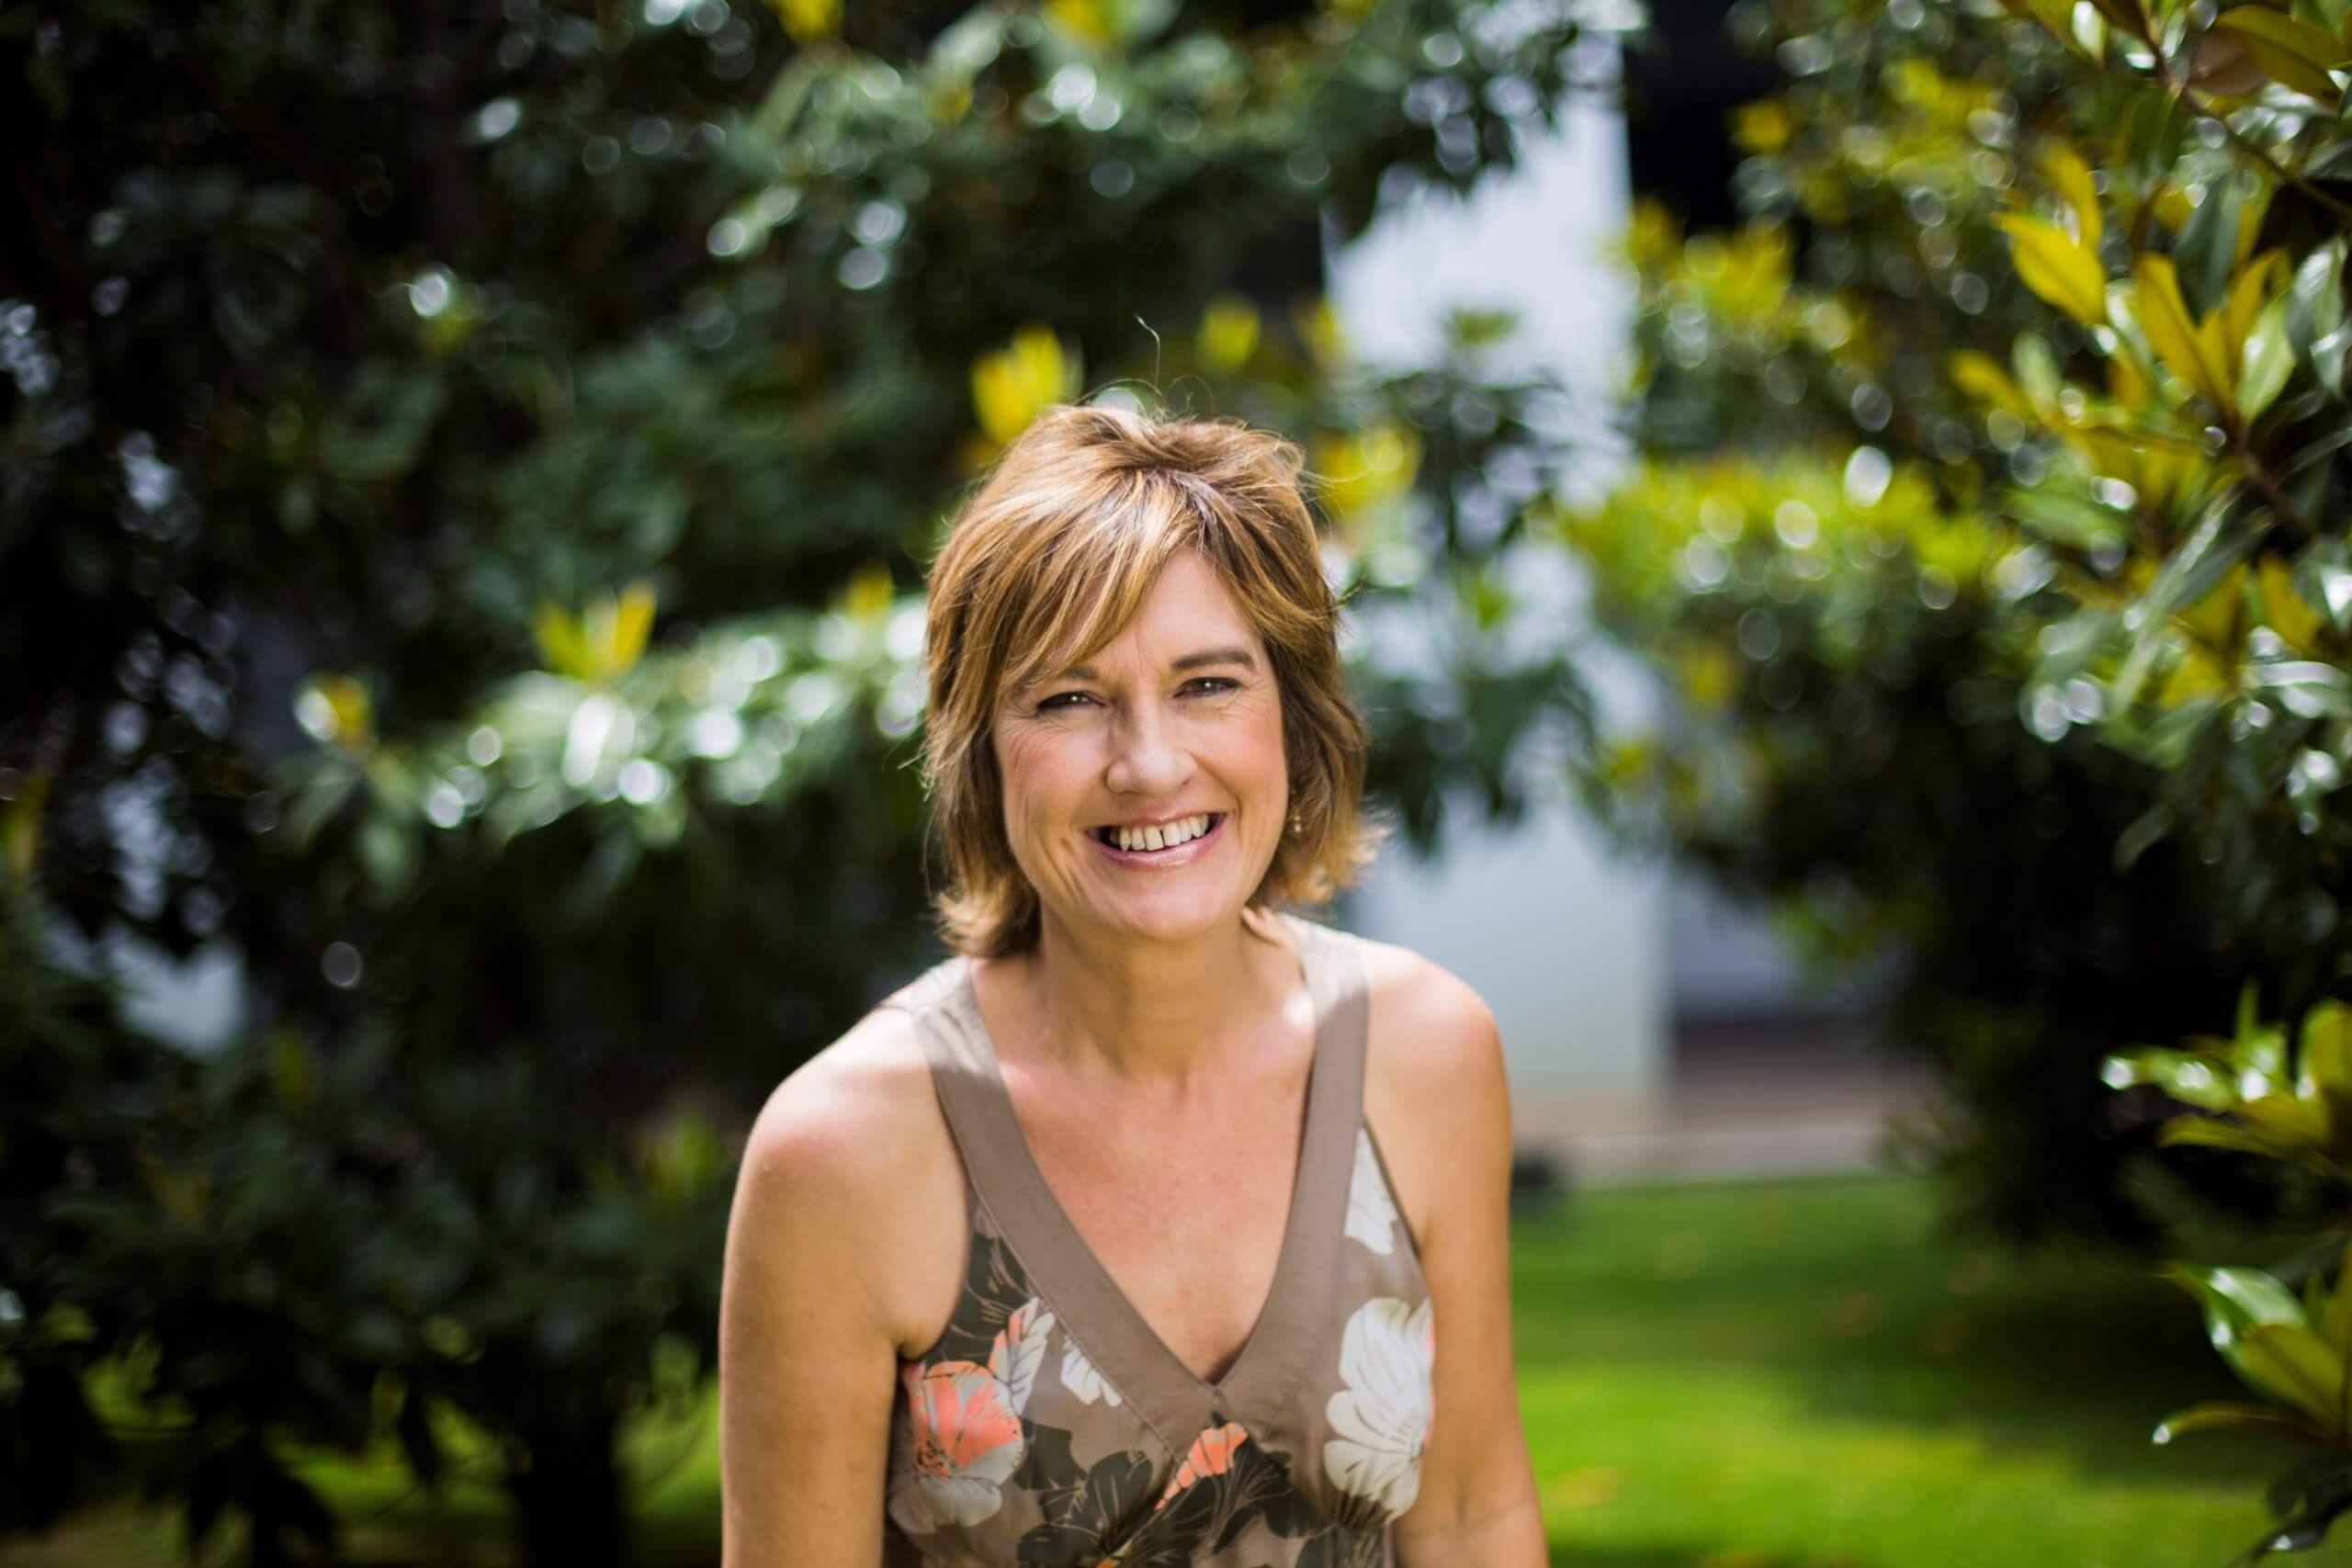 Costa Women women's expat group founder Ali Meehan